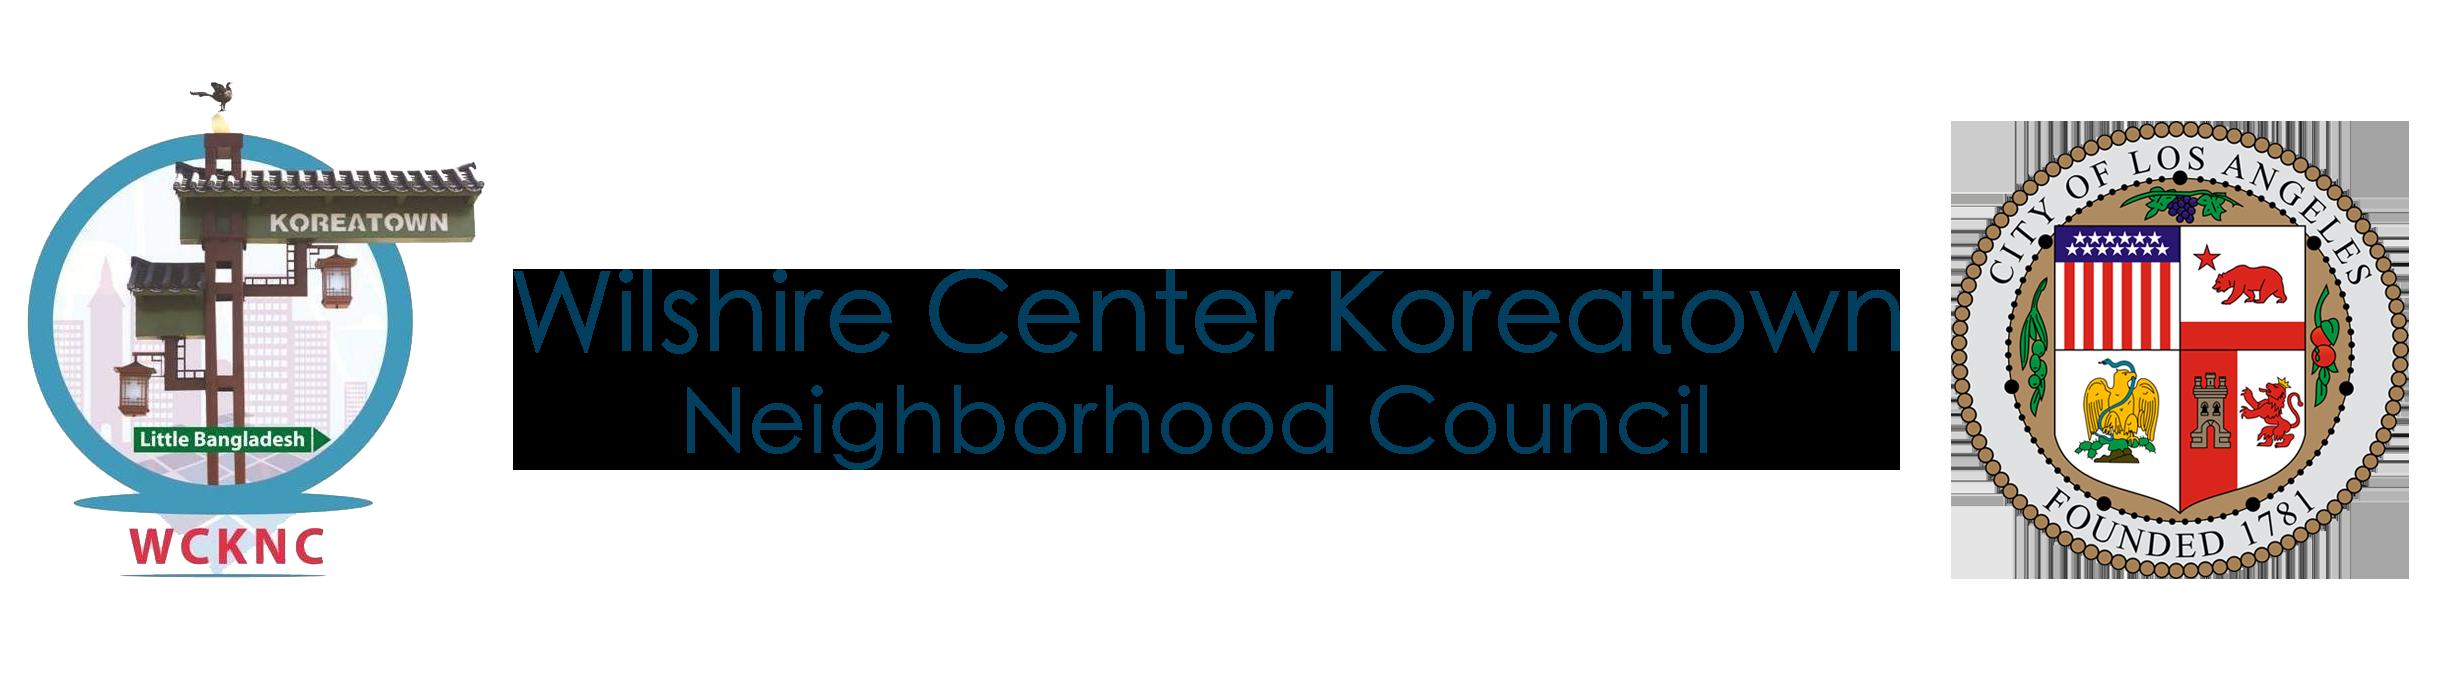 WCKNC Sponsor Logo Extra Space.png